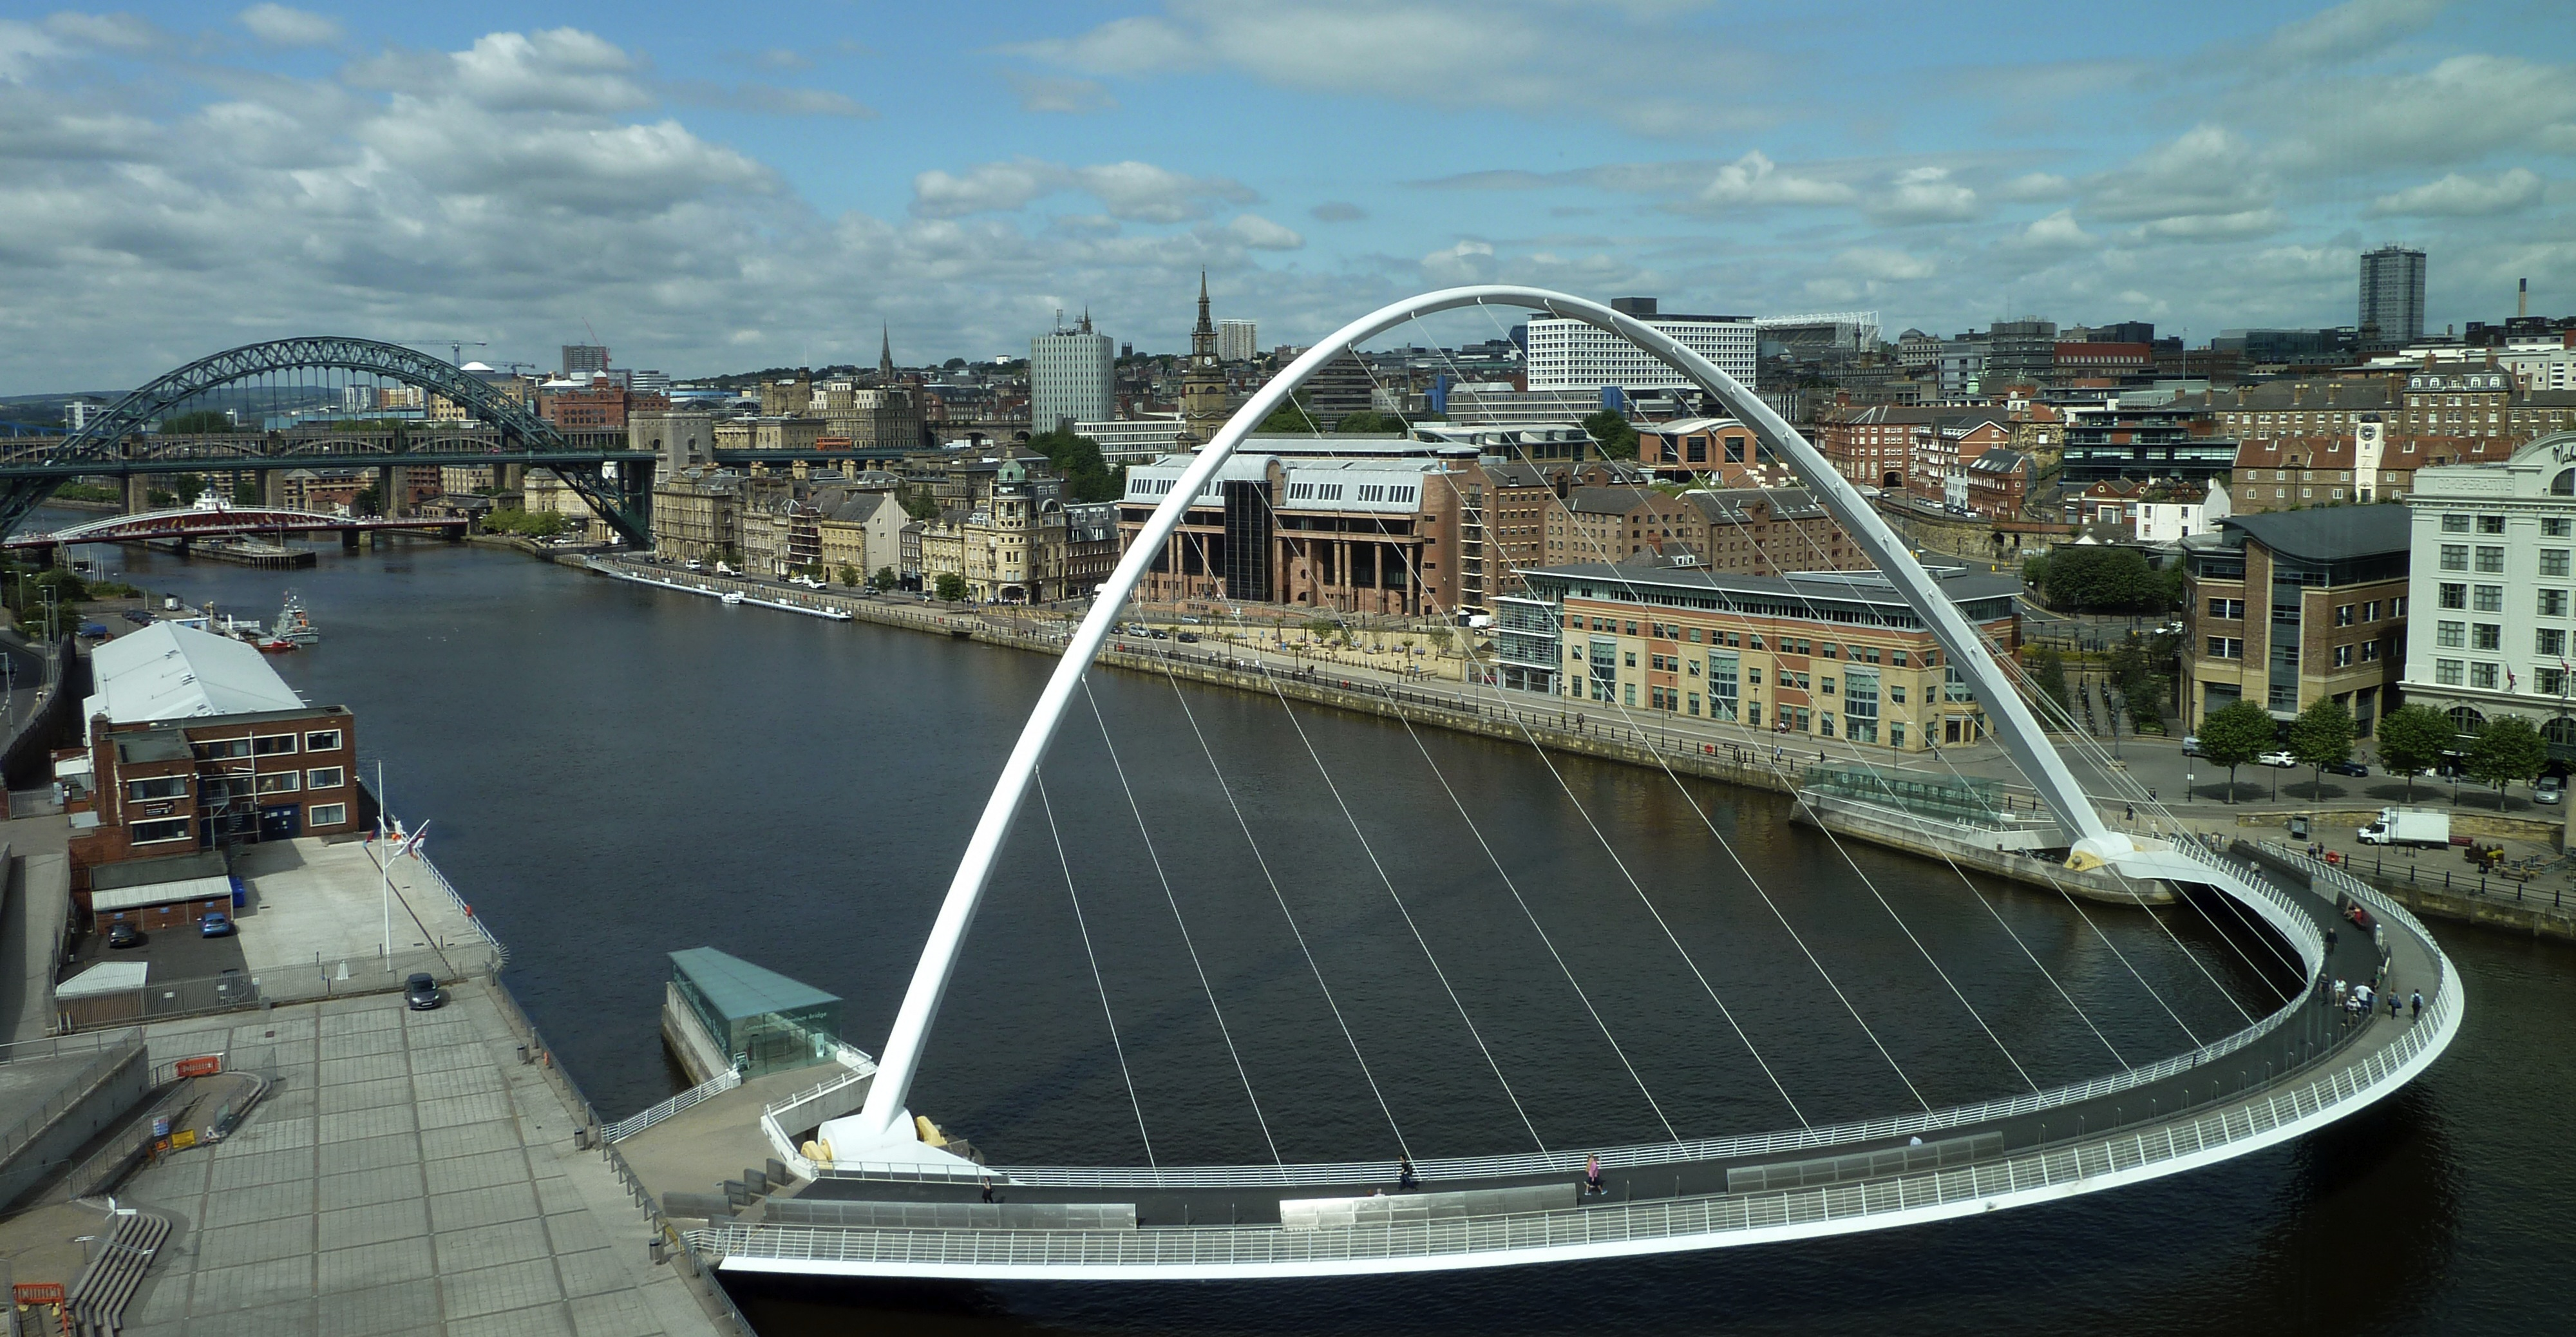 Newcastle-upon-Tyne-bridges-and-skyline_cropped